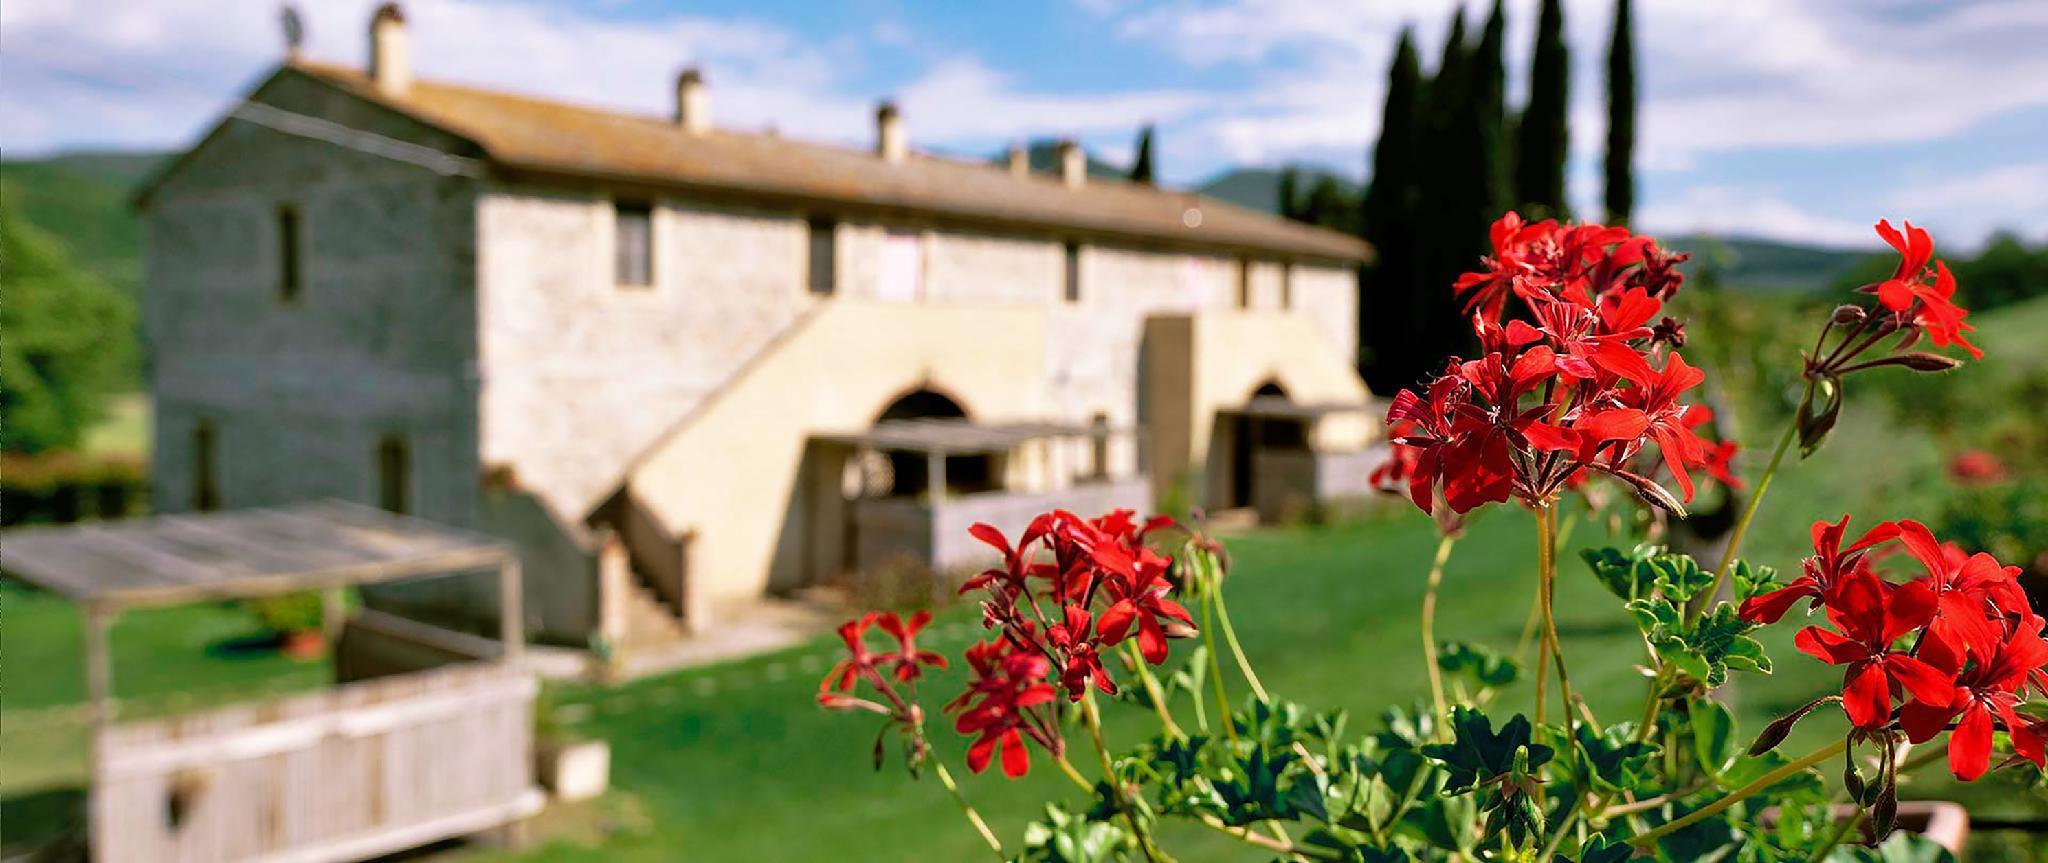 Sunny Apartment In Beautiful Tuscany